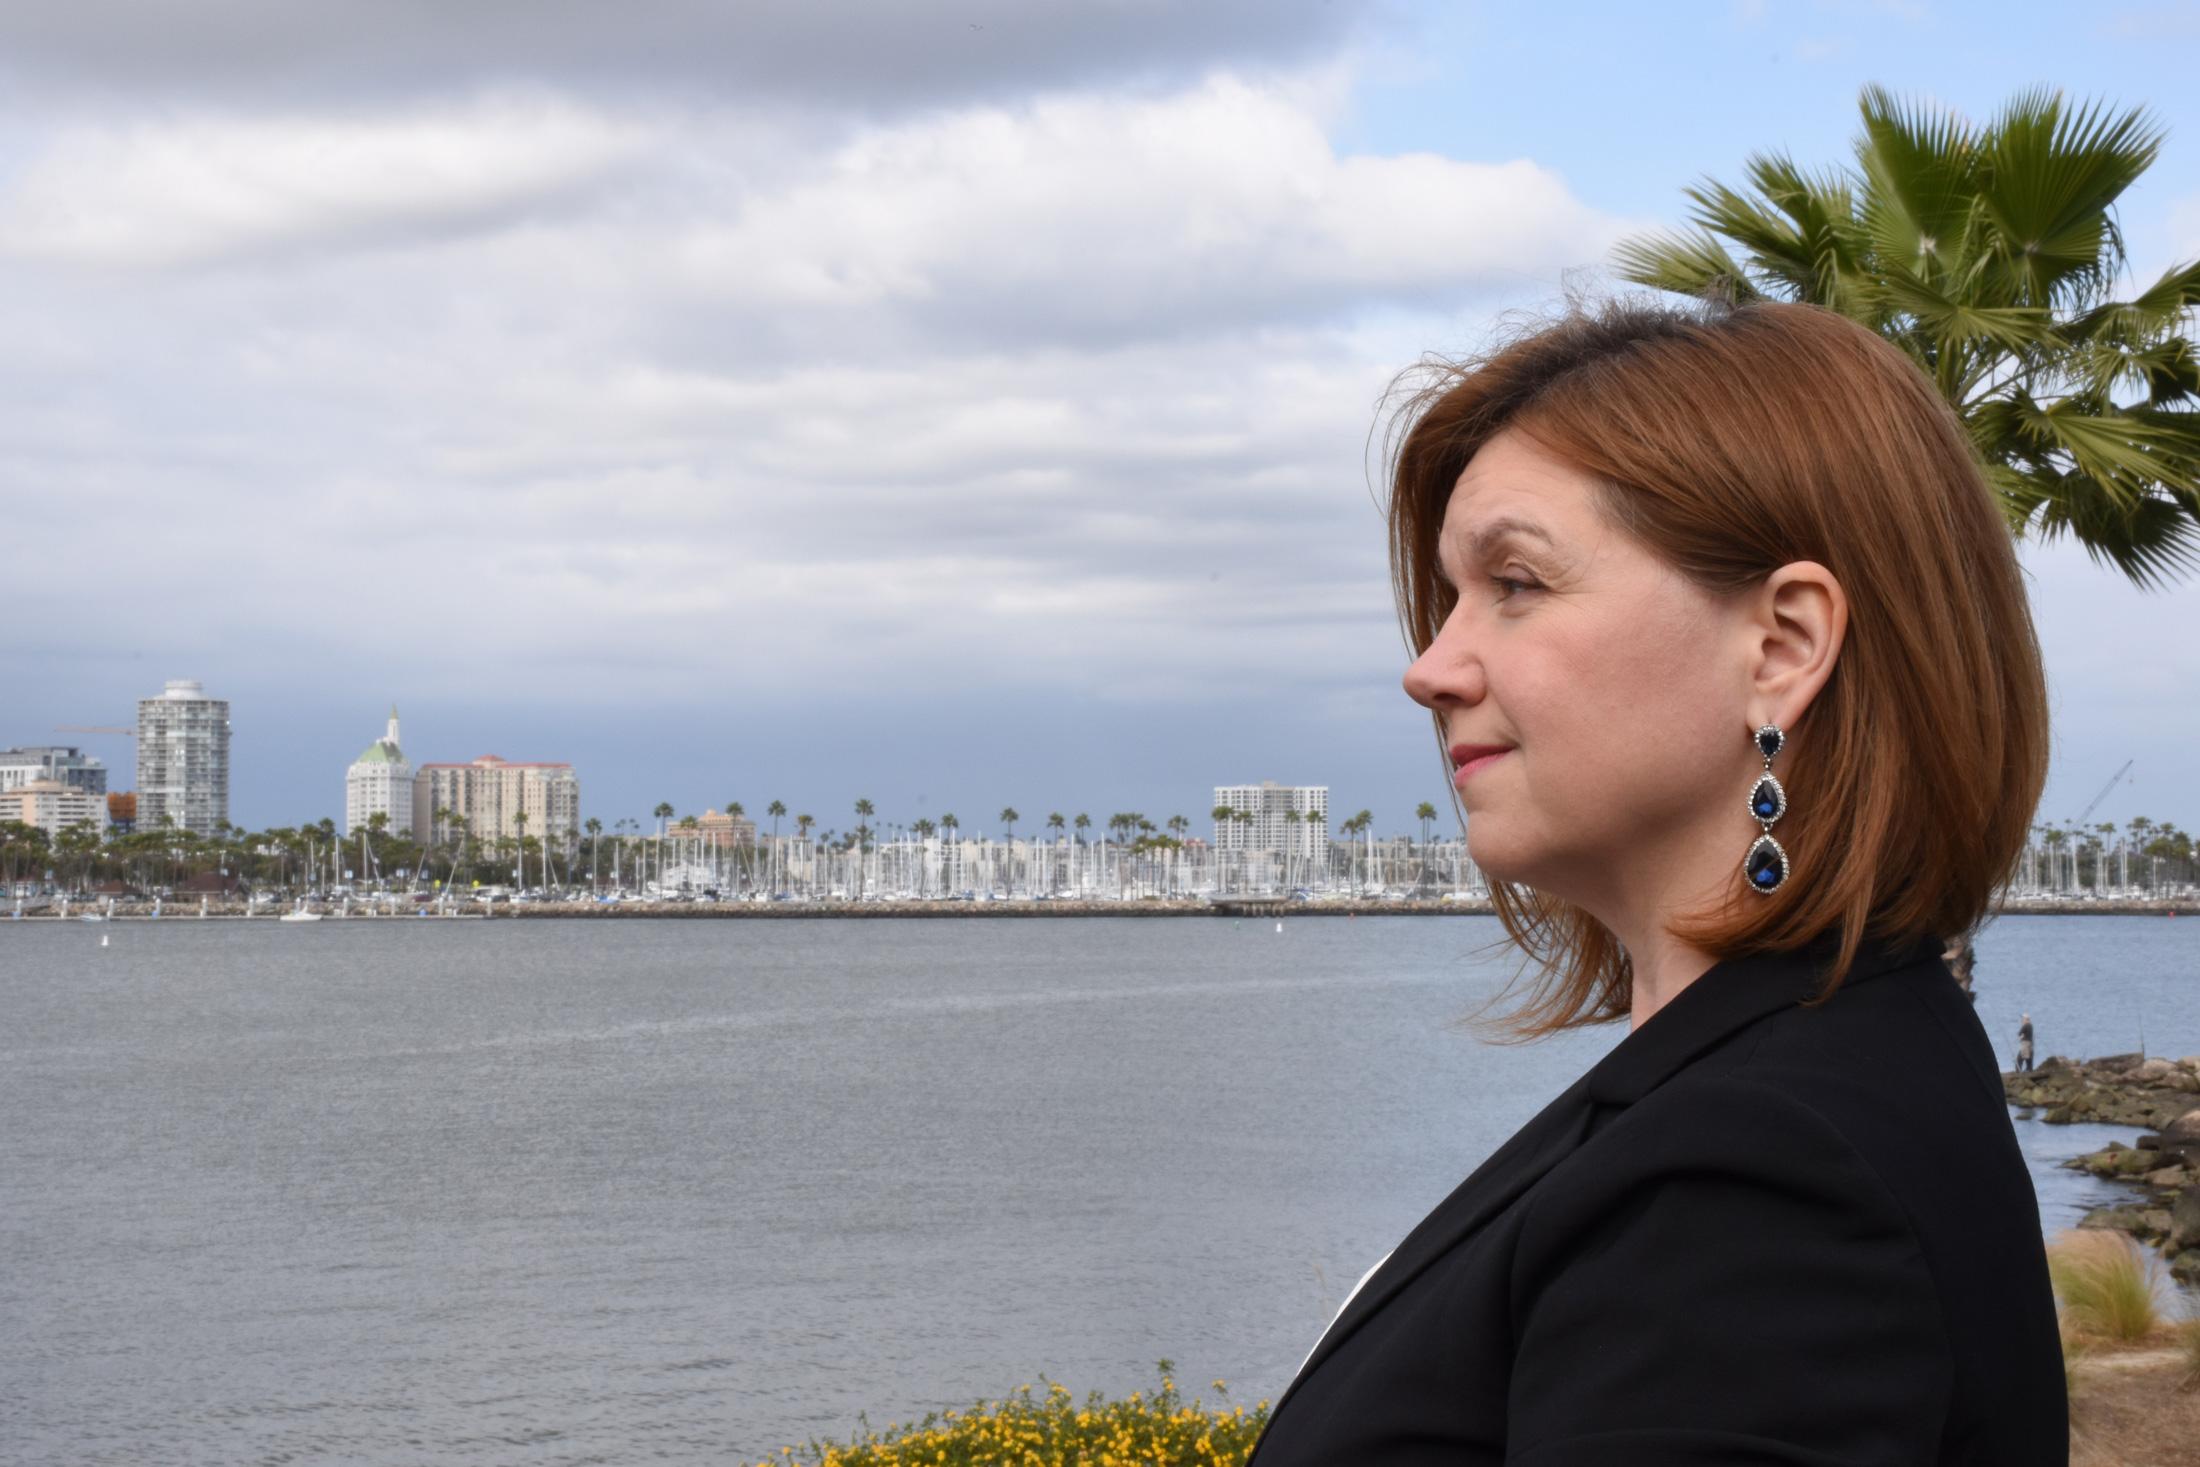 Kat looking at Long Beach shoreline